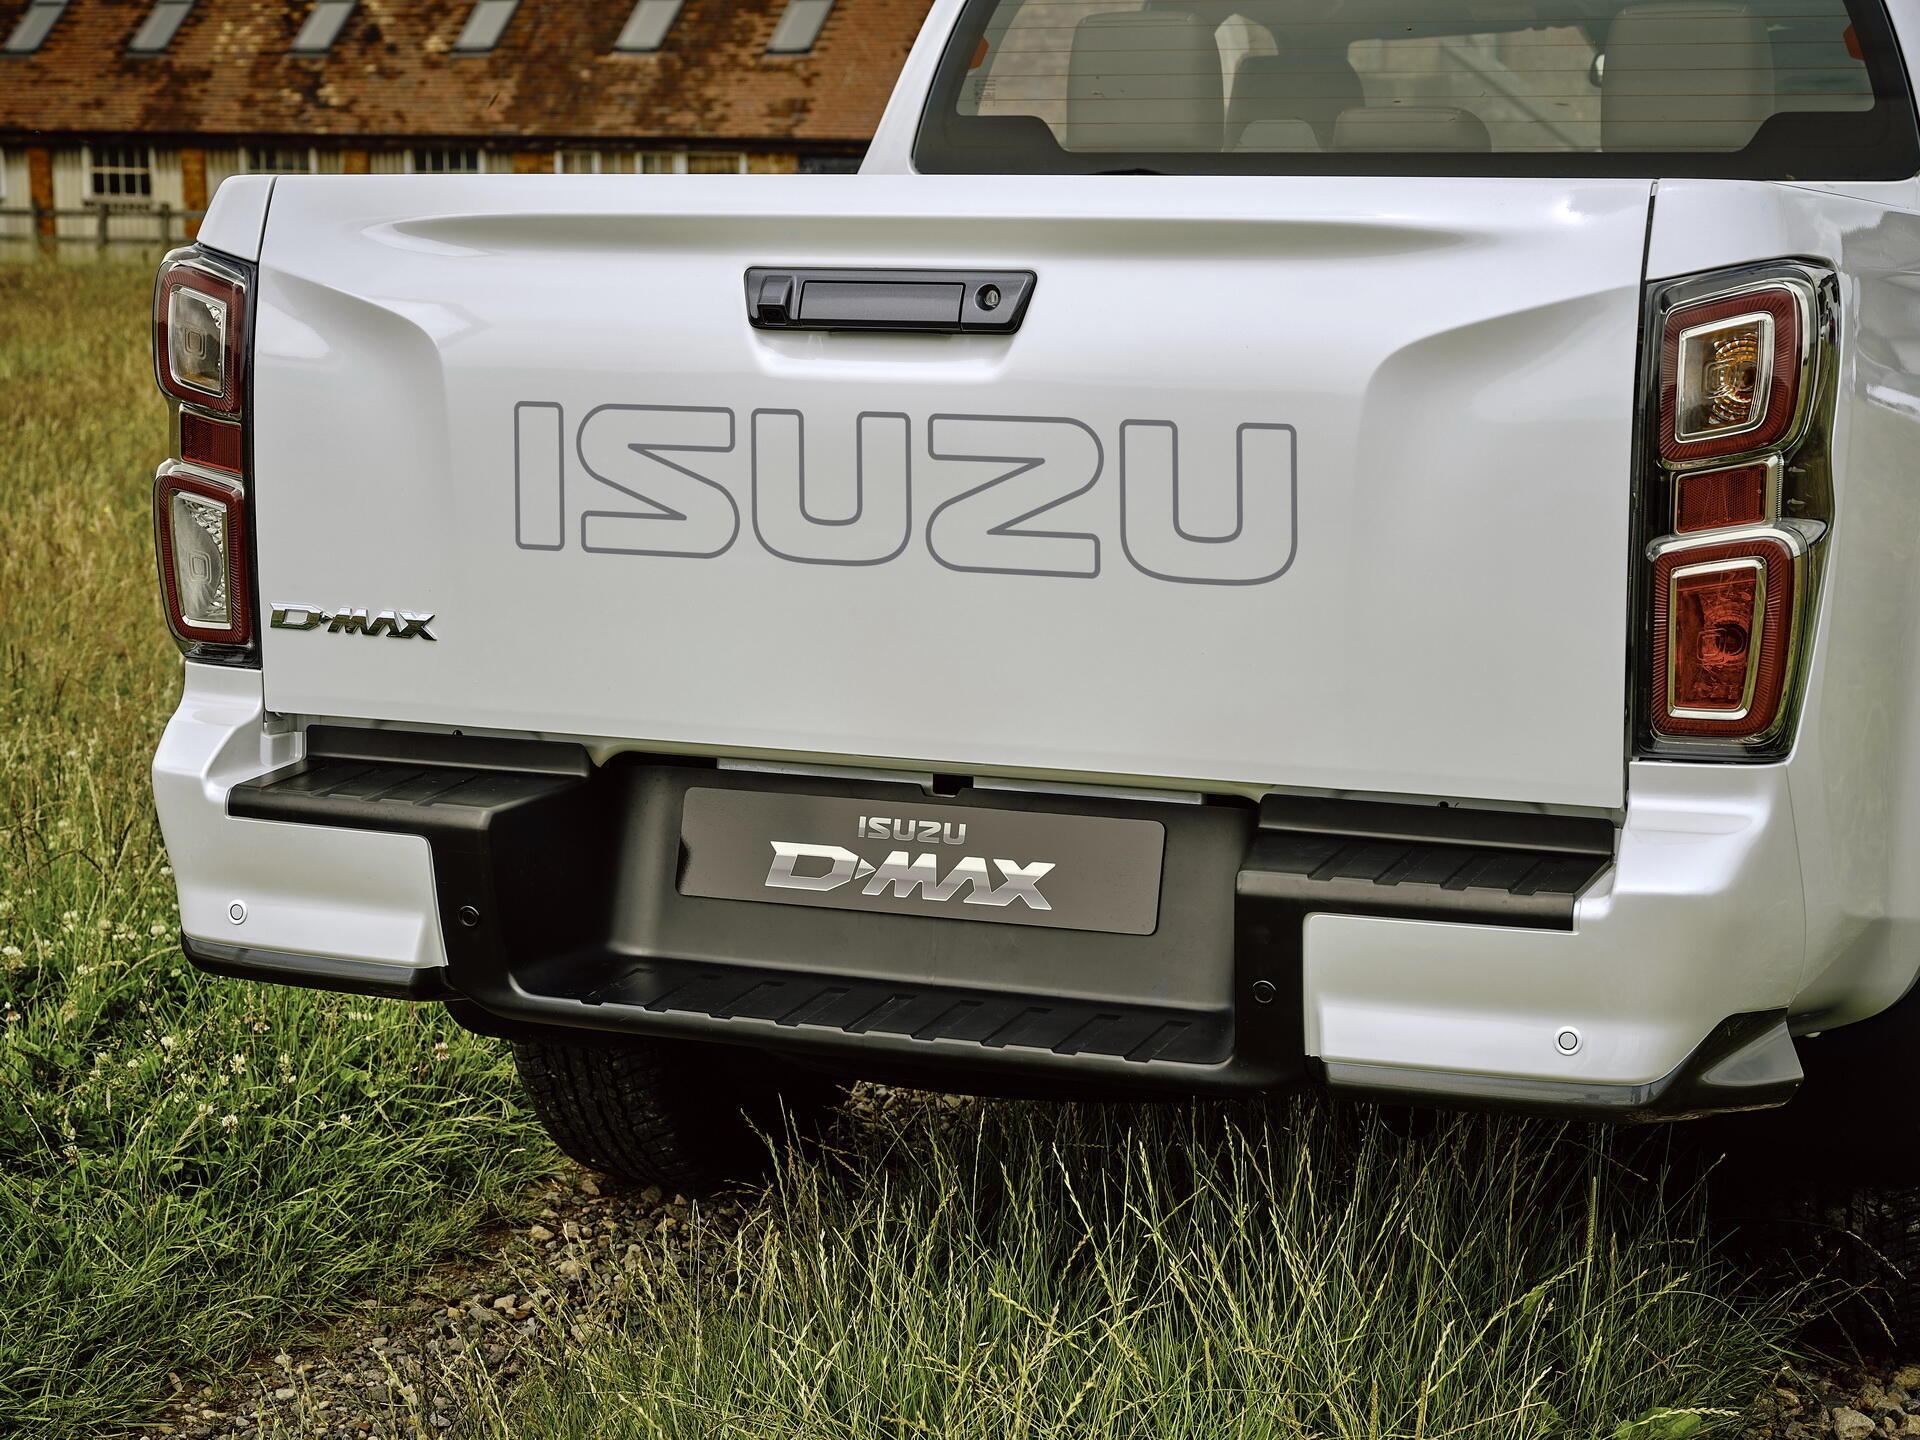 isuzu-d-max-2021-hoan-toan-moi-chot-gia-tu-29-479-usd